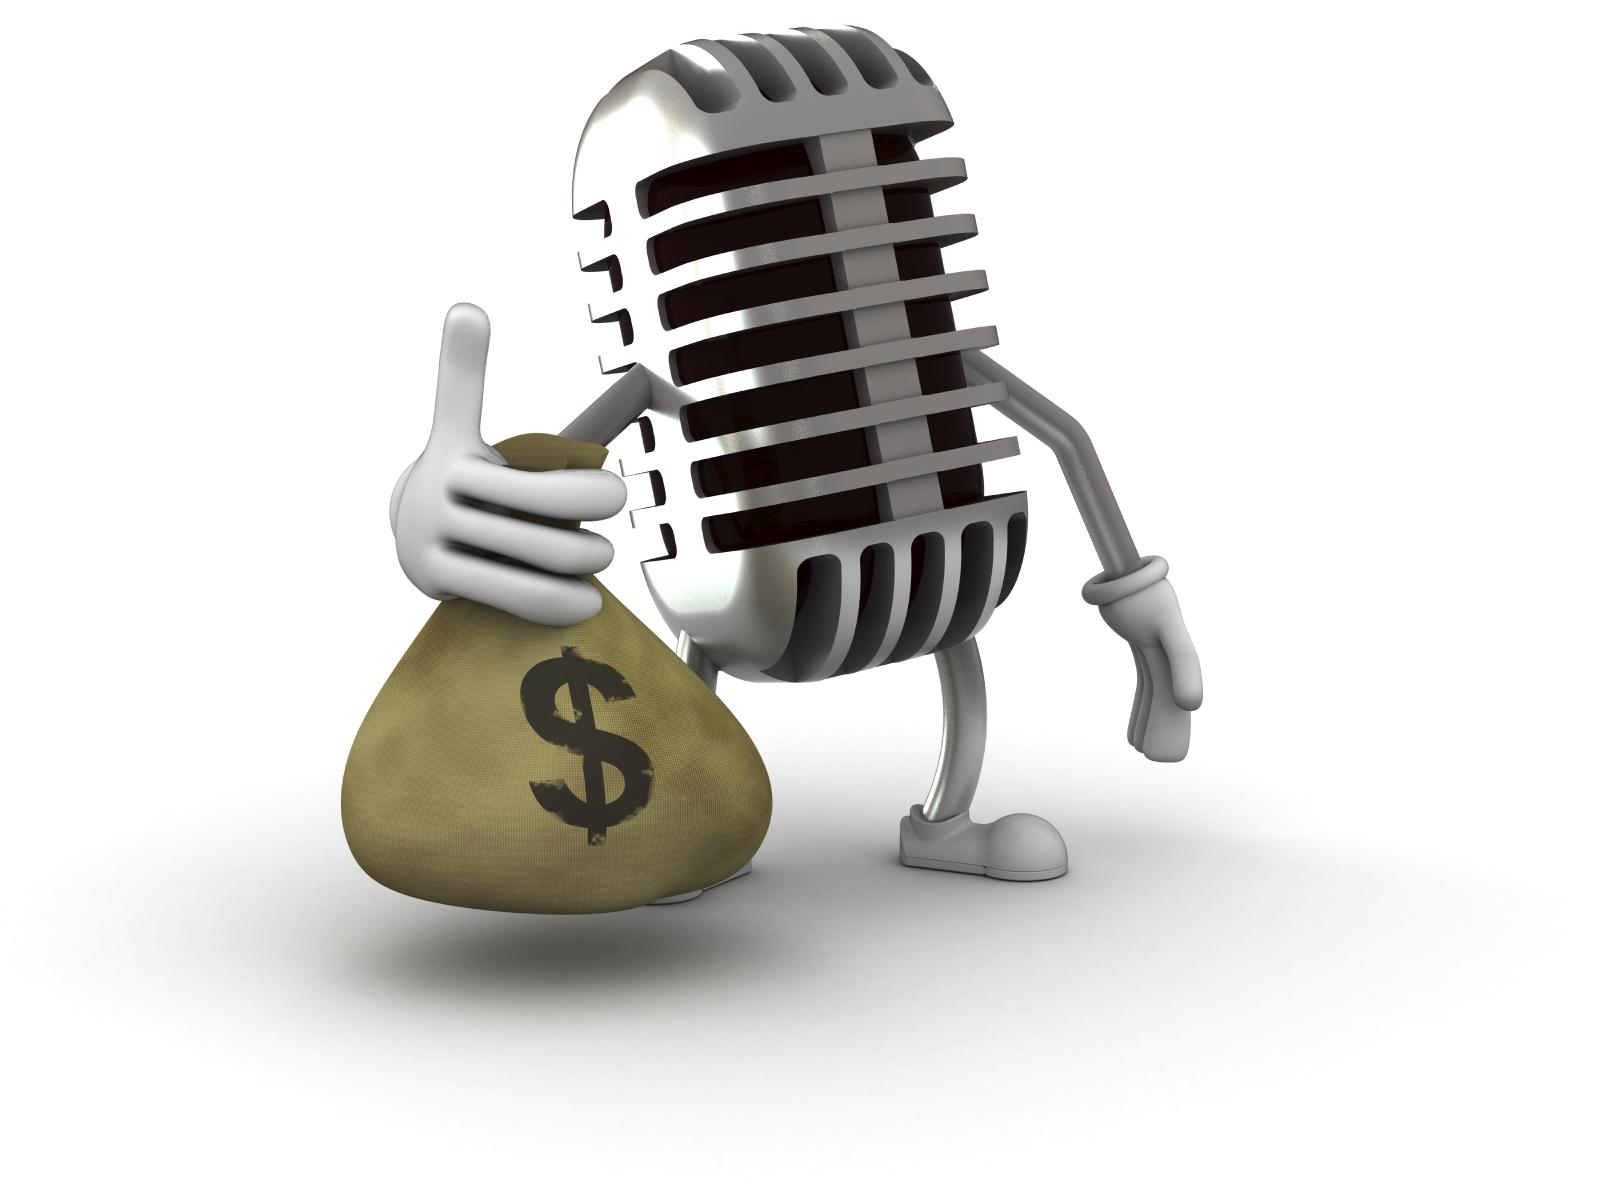 The basics of Music Royalties: soundslikejoe.com/music-royalties-basics